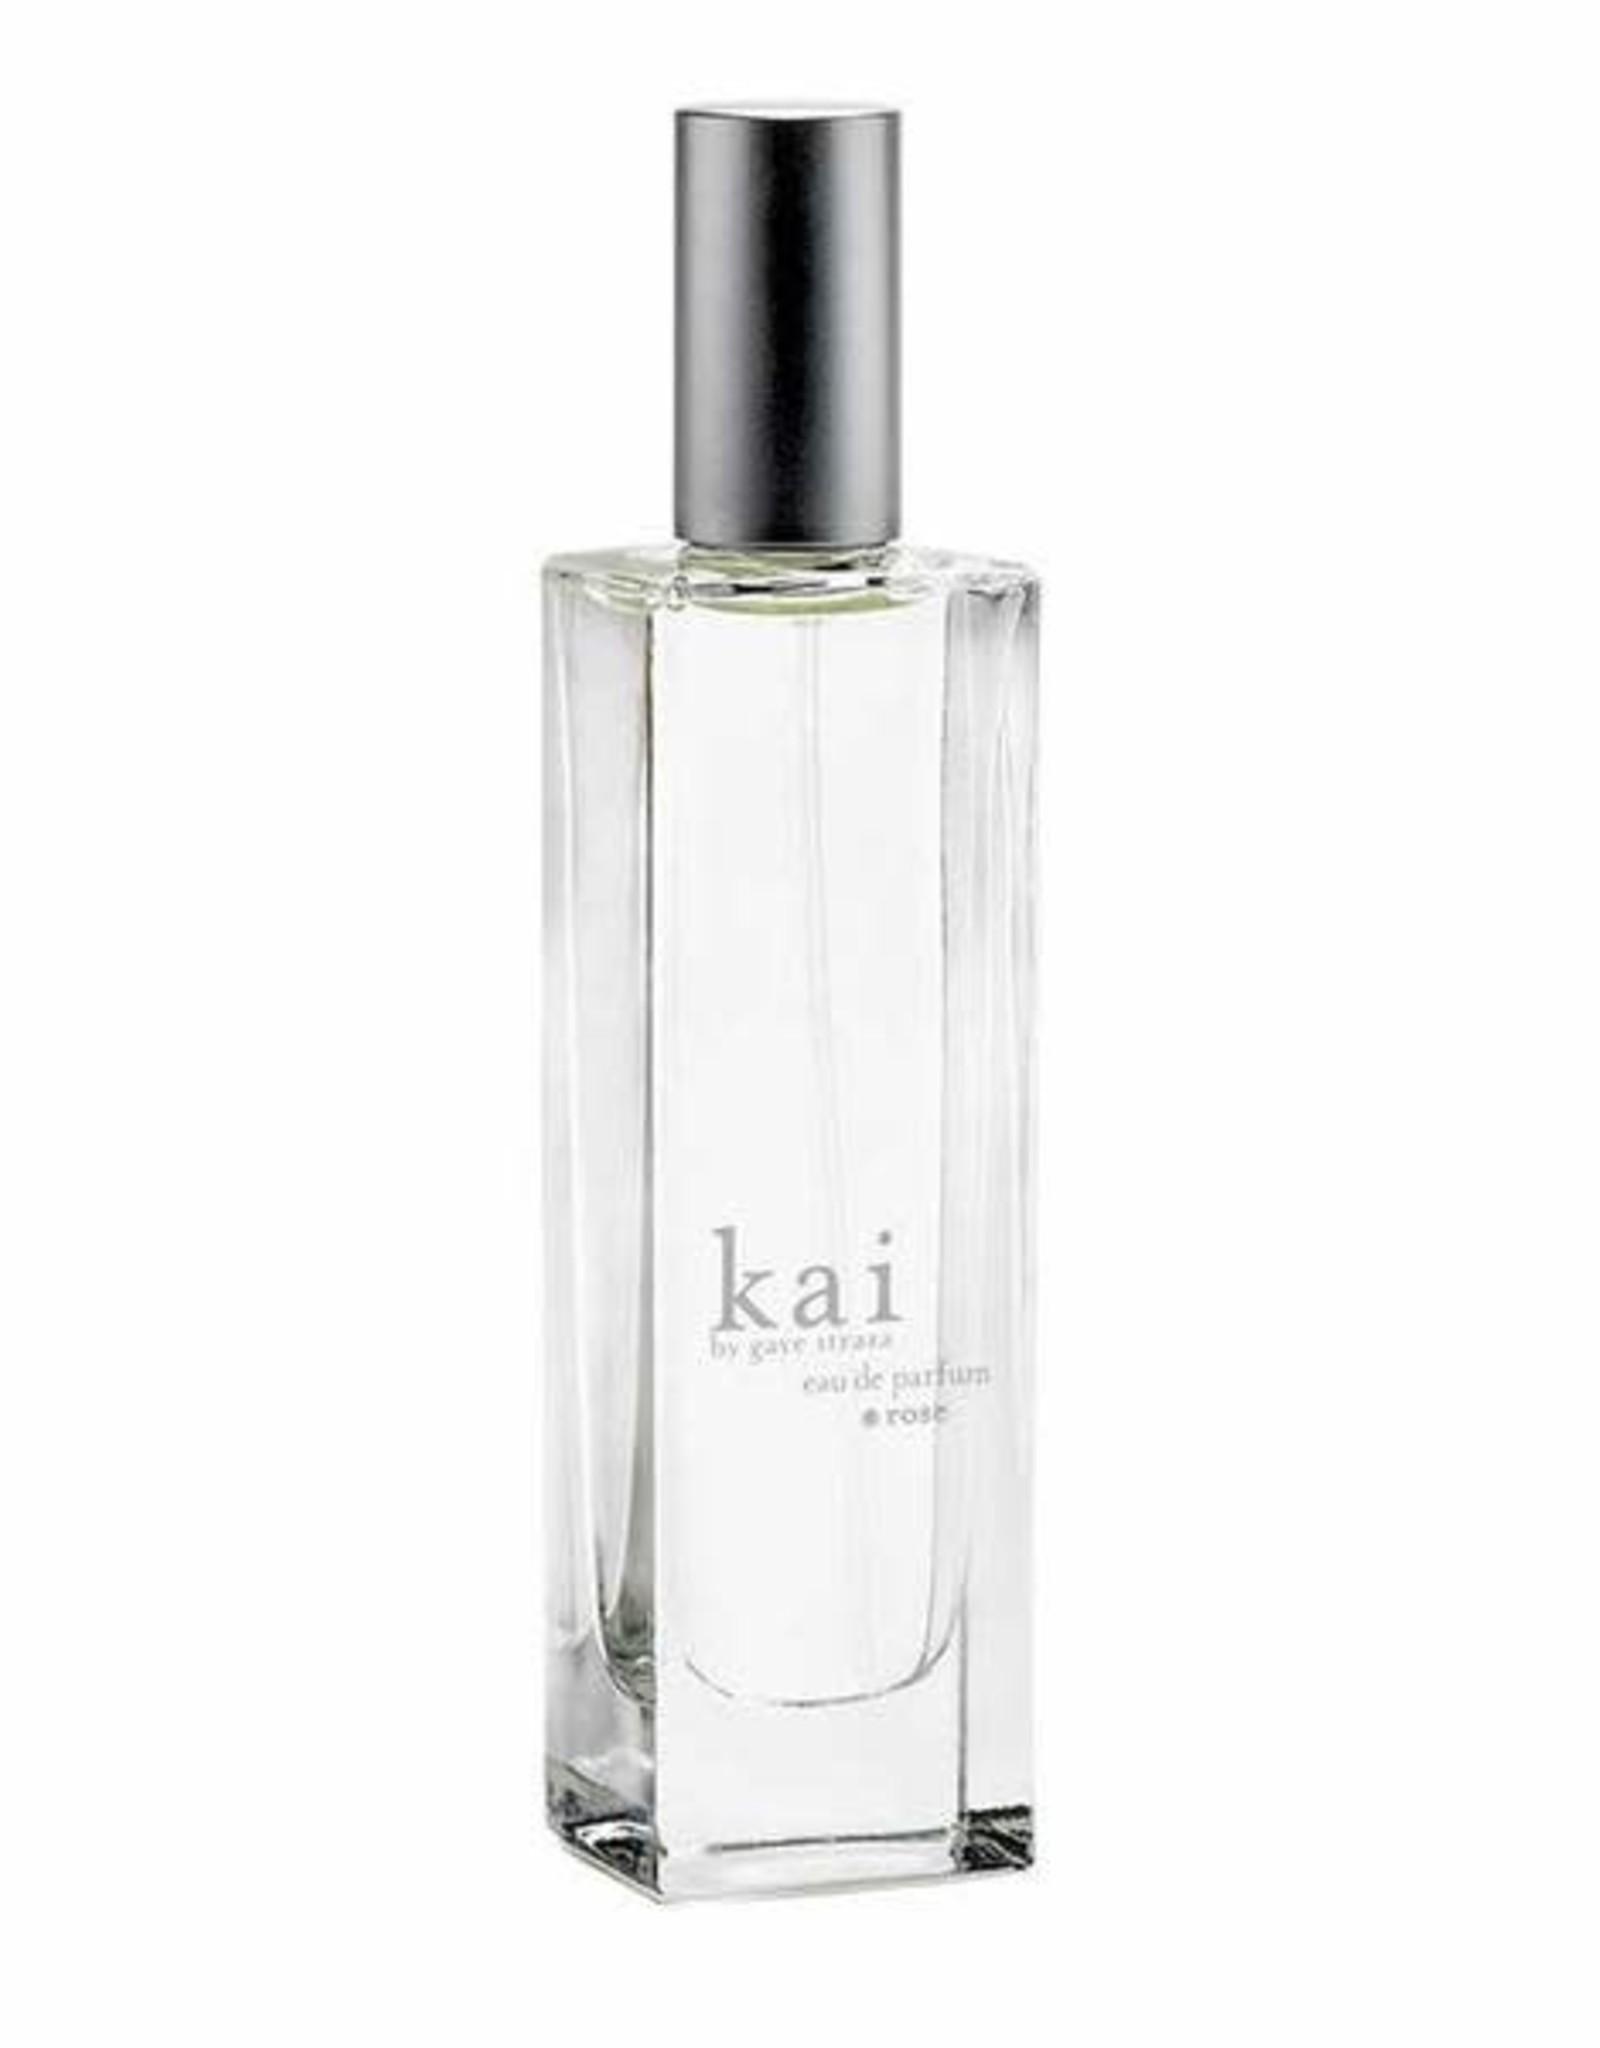 Gifts Kai by Gaye Straza eau de Parfum Rose 1.7oz Spray Bottle